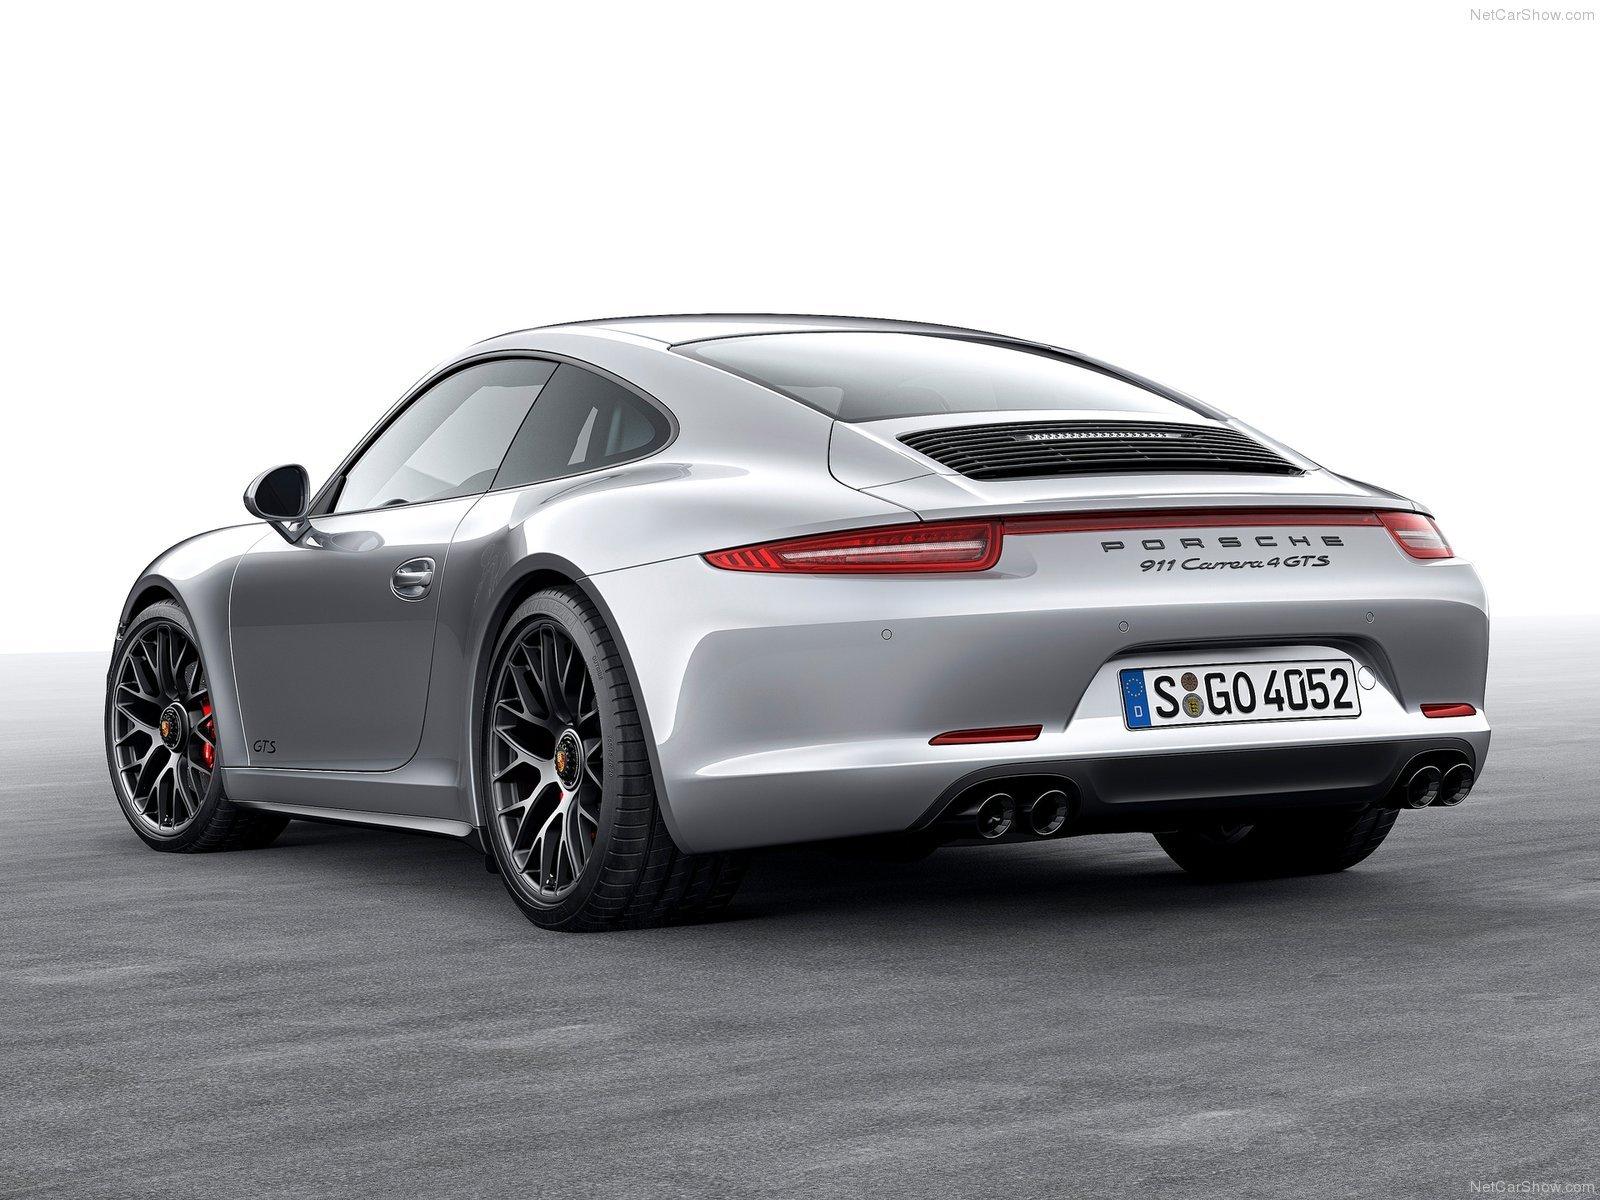 porsche 911 carrera gts 2015 coupe convertible cars 2015 wallpaper